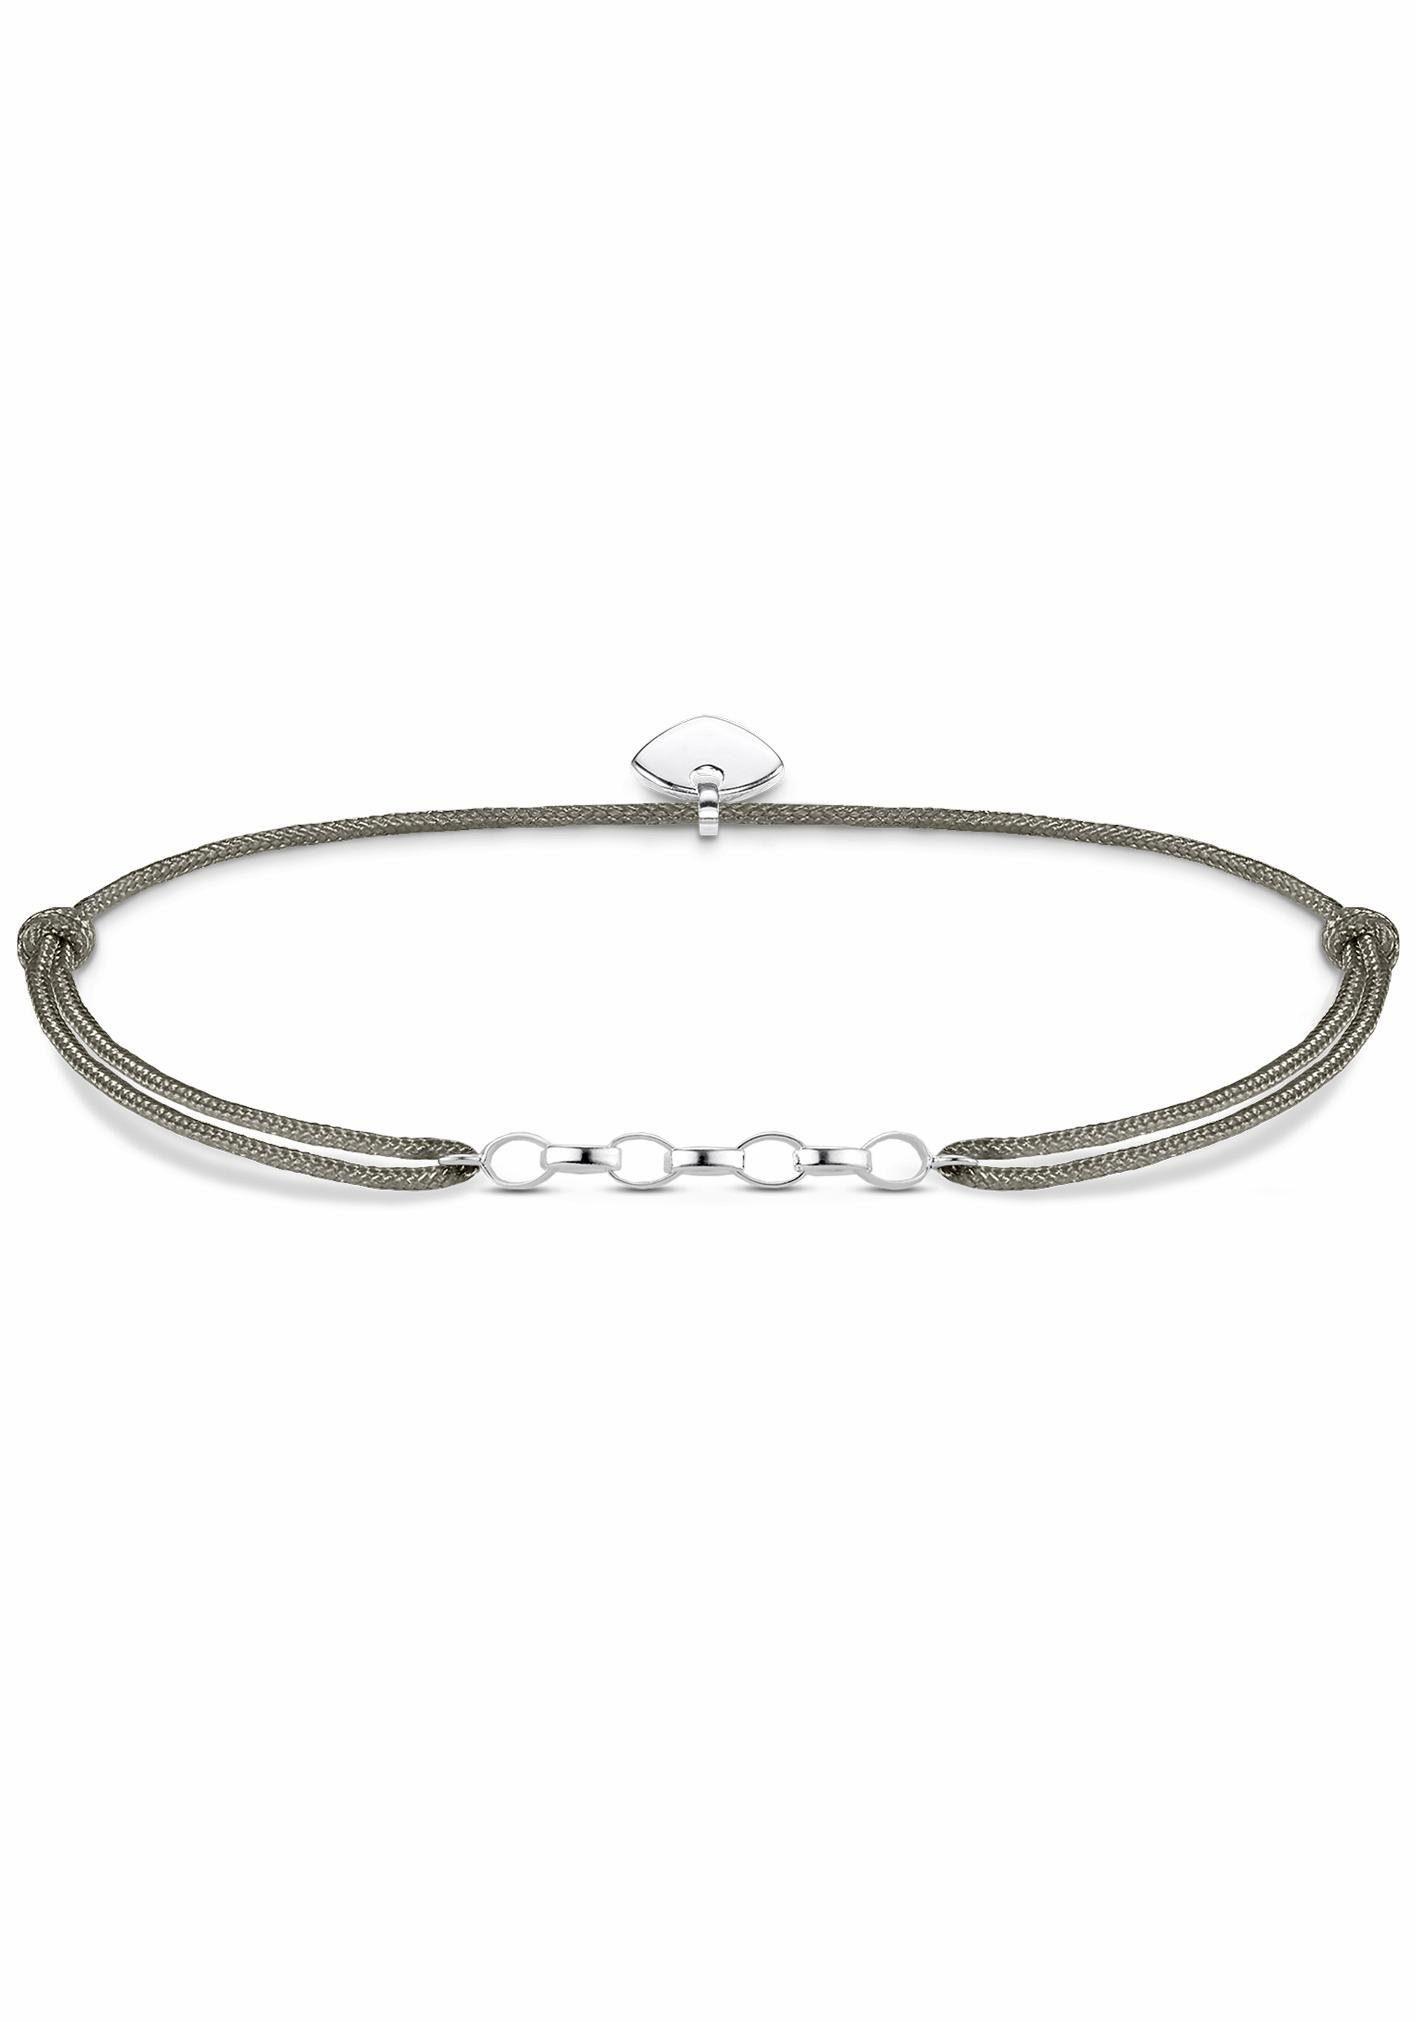 THOMAS SABO Charm-Armband »Little Secret Herz, LS047-173-5-L20v«